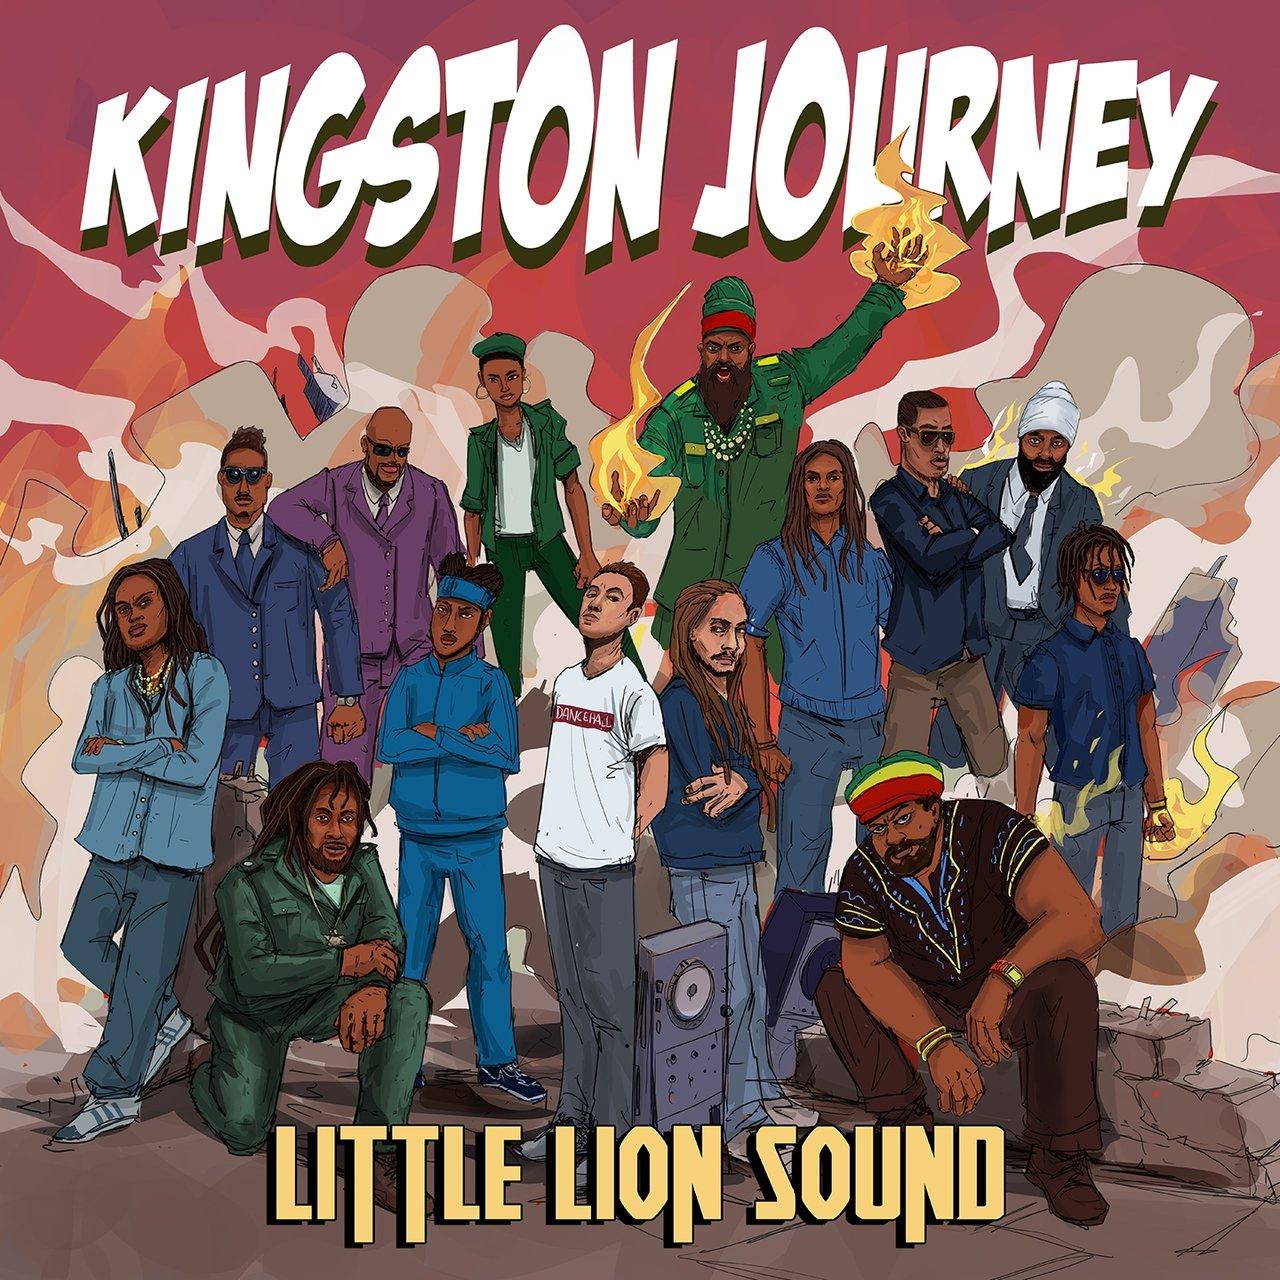 Little Lion Sound - Kingston Journey (Cover)